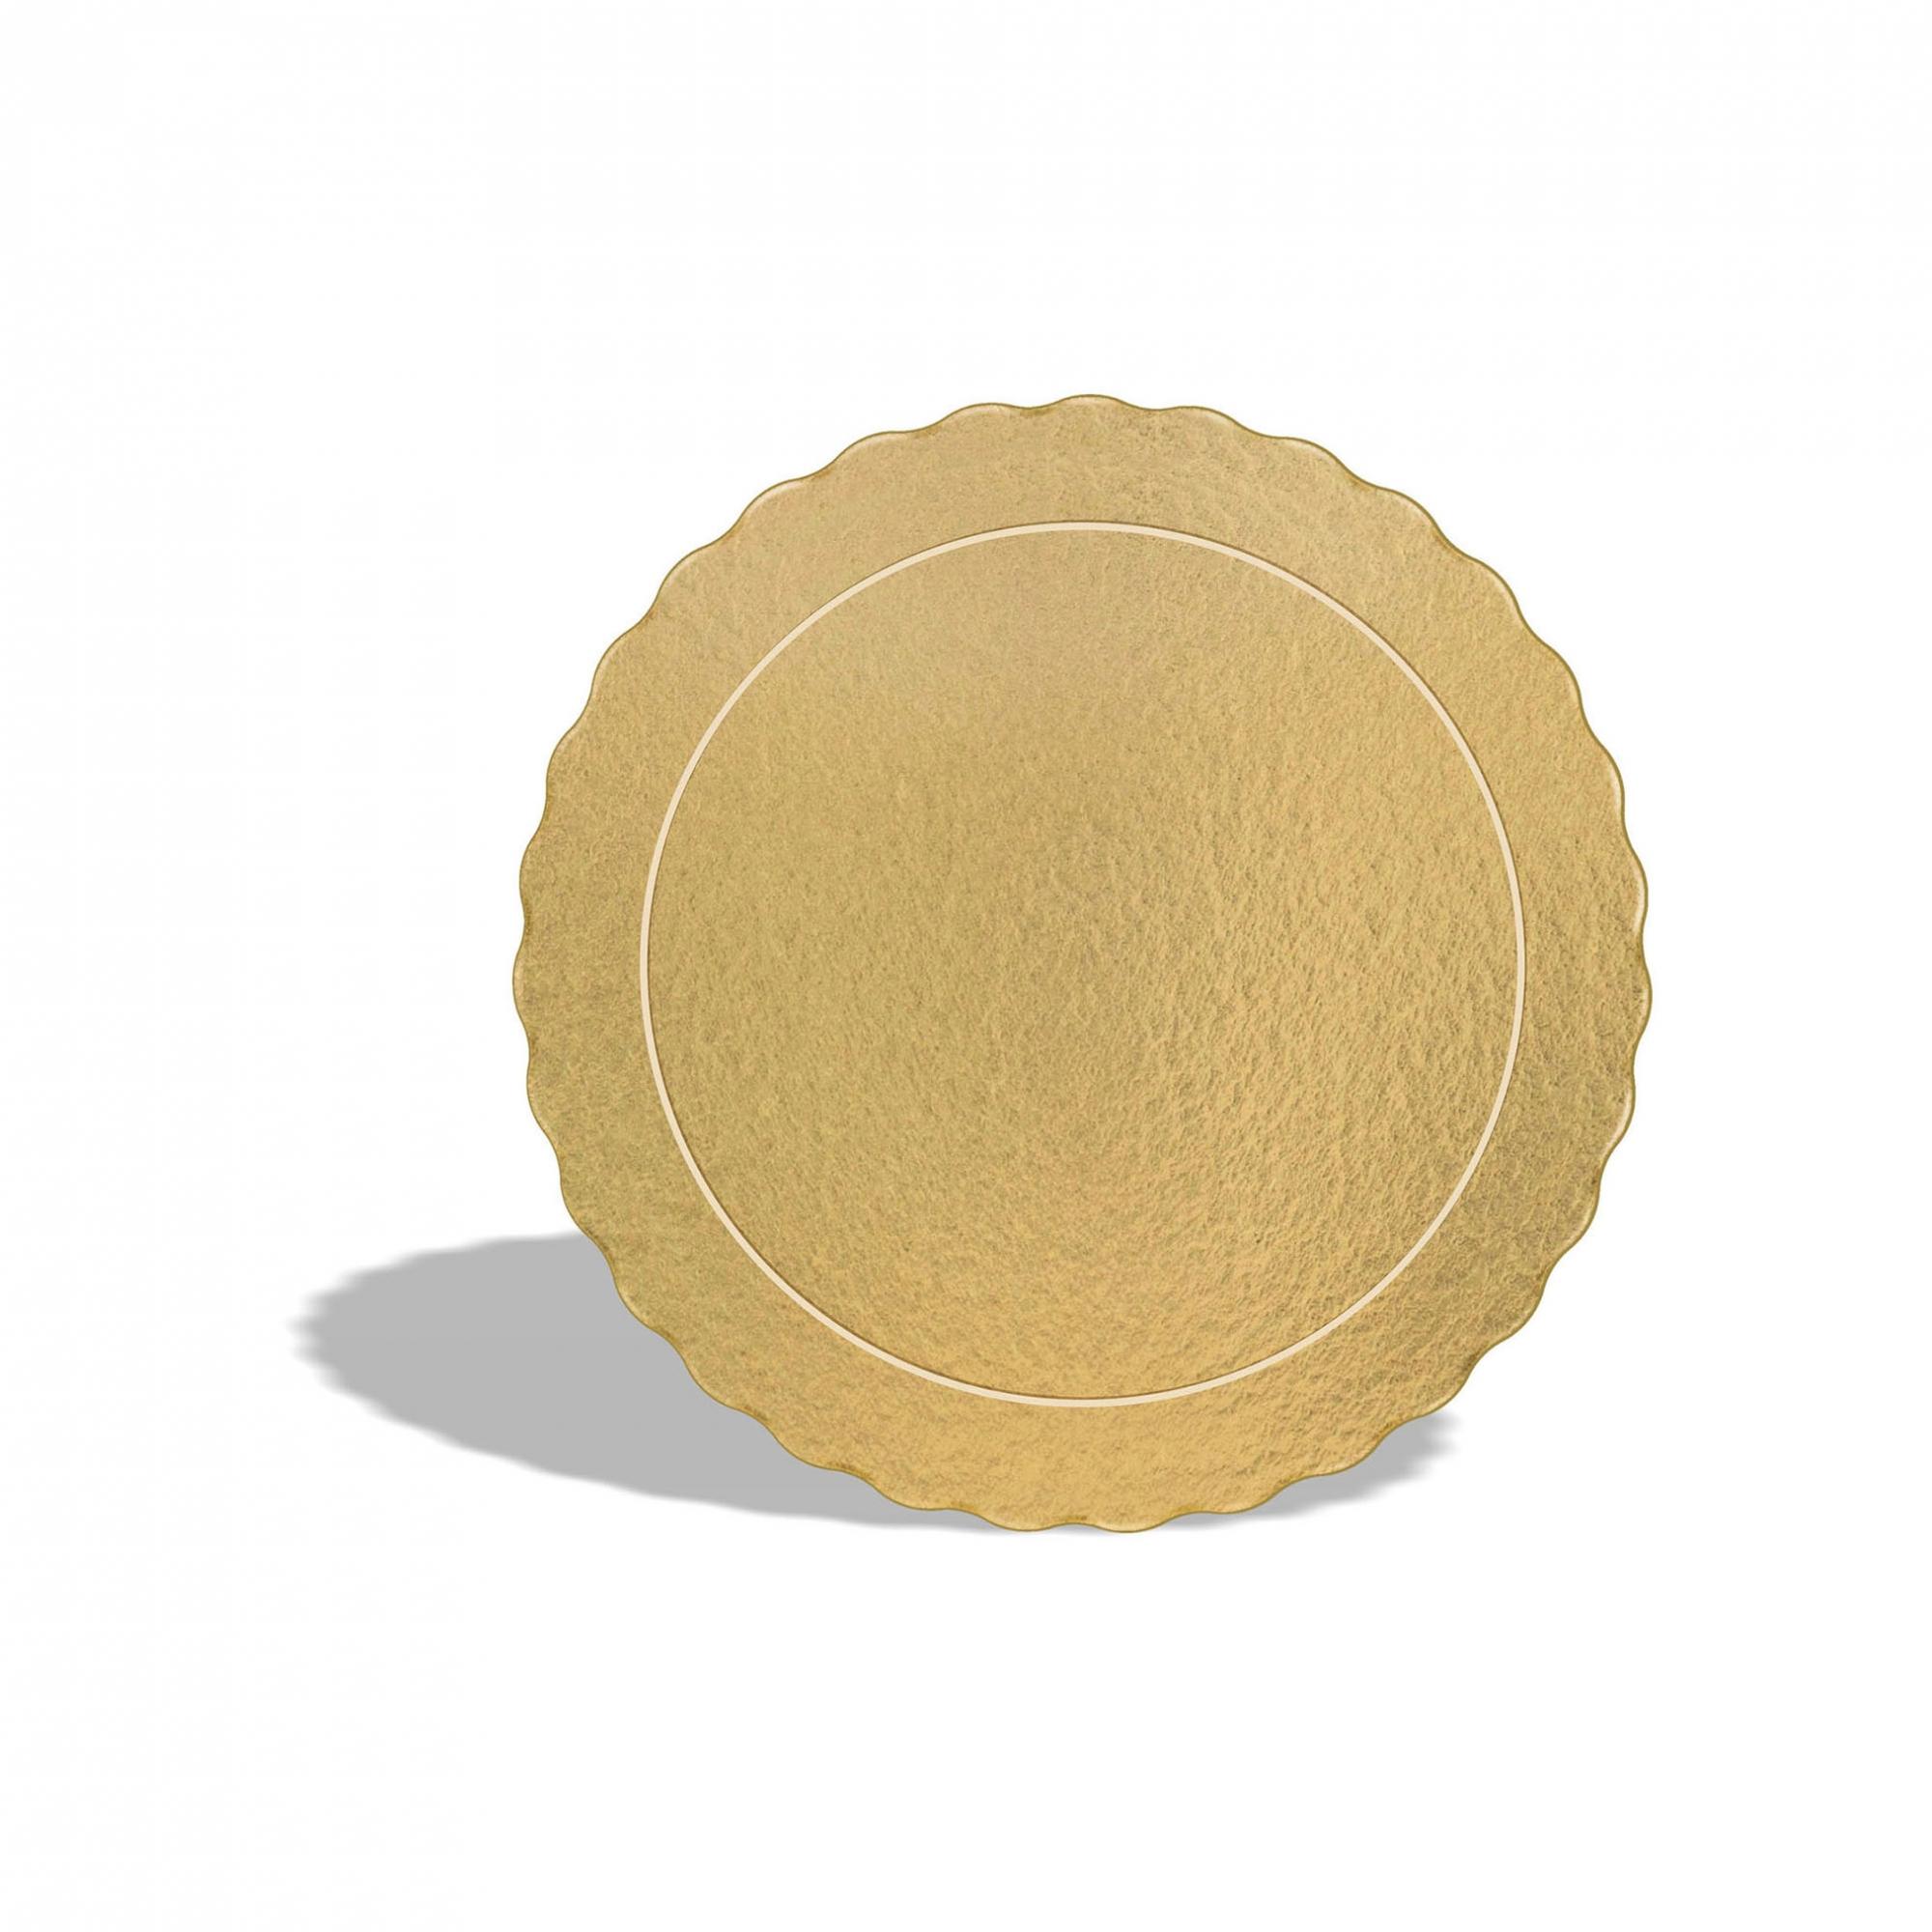 200 Bases Laminadas, Suporte P/ Bolo, Cake Board, 24cm - Ouro